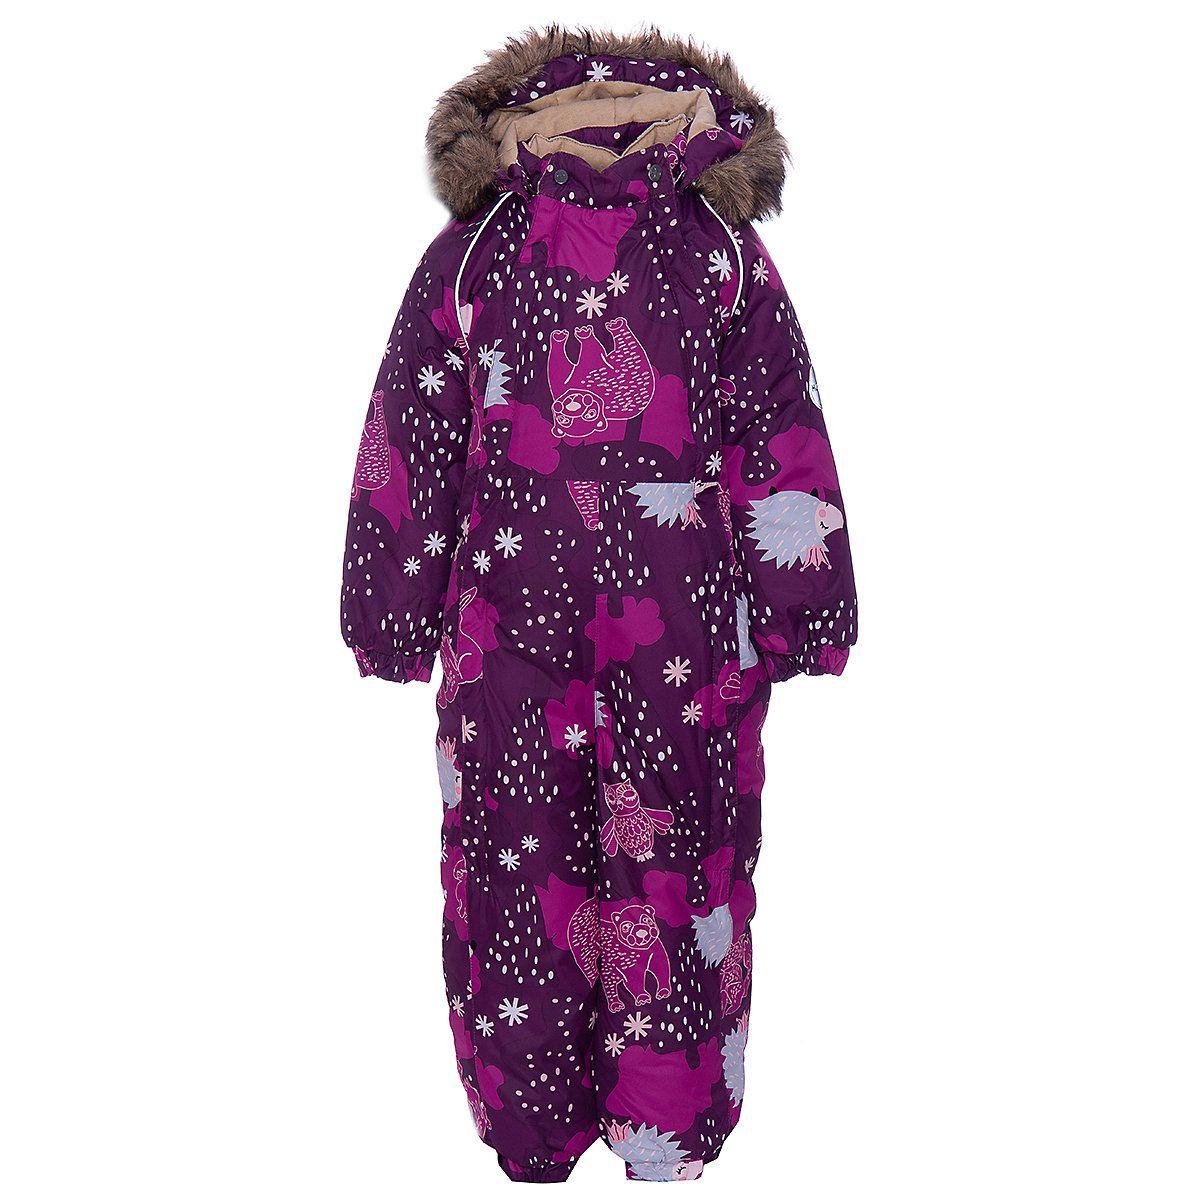 Overalls HUPPA für mädchen 8959204 Baby Strampler Overall Kinder kleidung Kinder